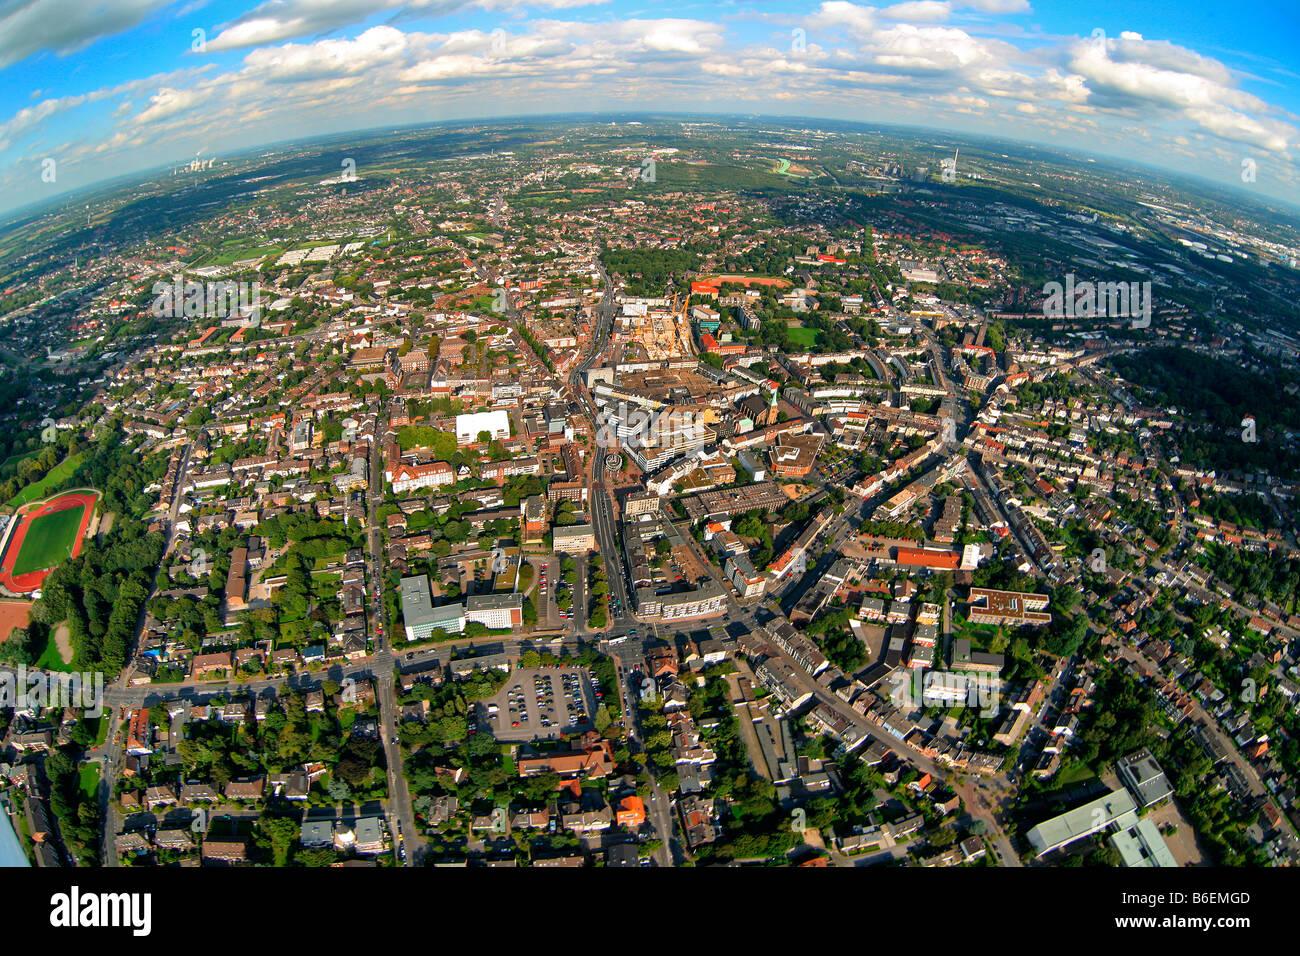 Aerial photograph, long shot, fisheye shot, inner city, Bottrop, Ruhr Area, North Rhine-Westphalia, Germany, Europe - Stock Image